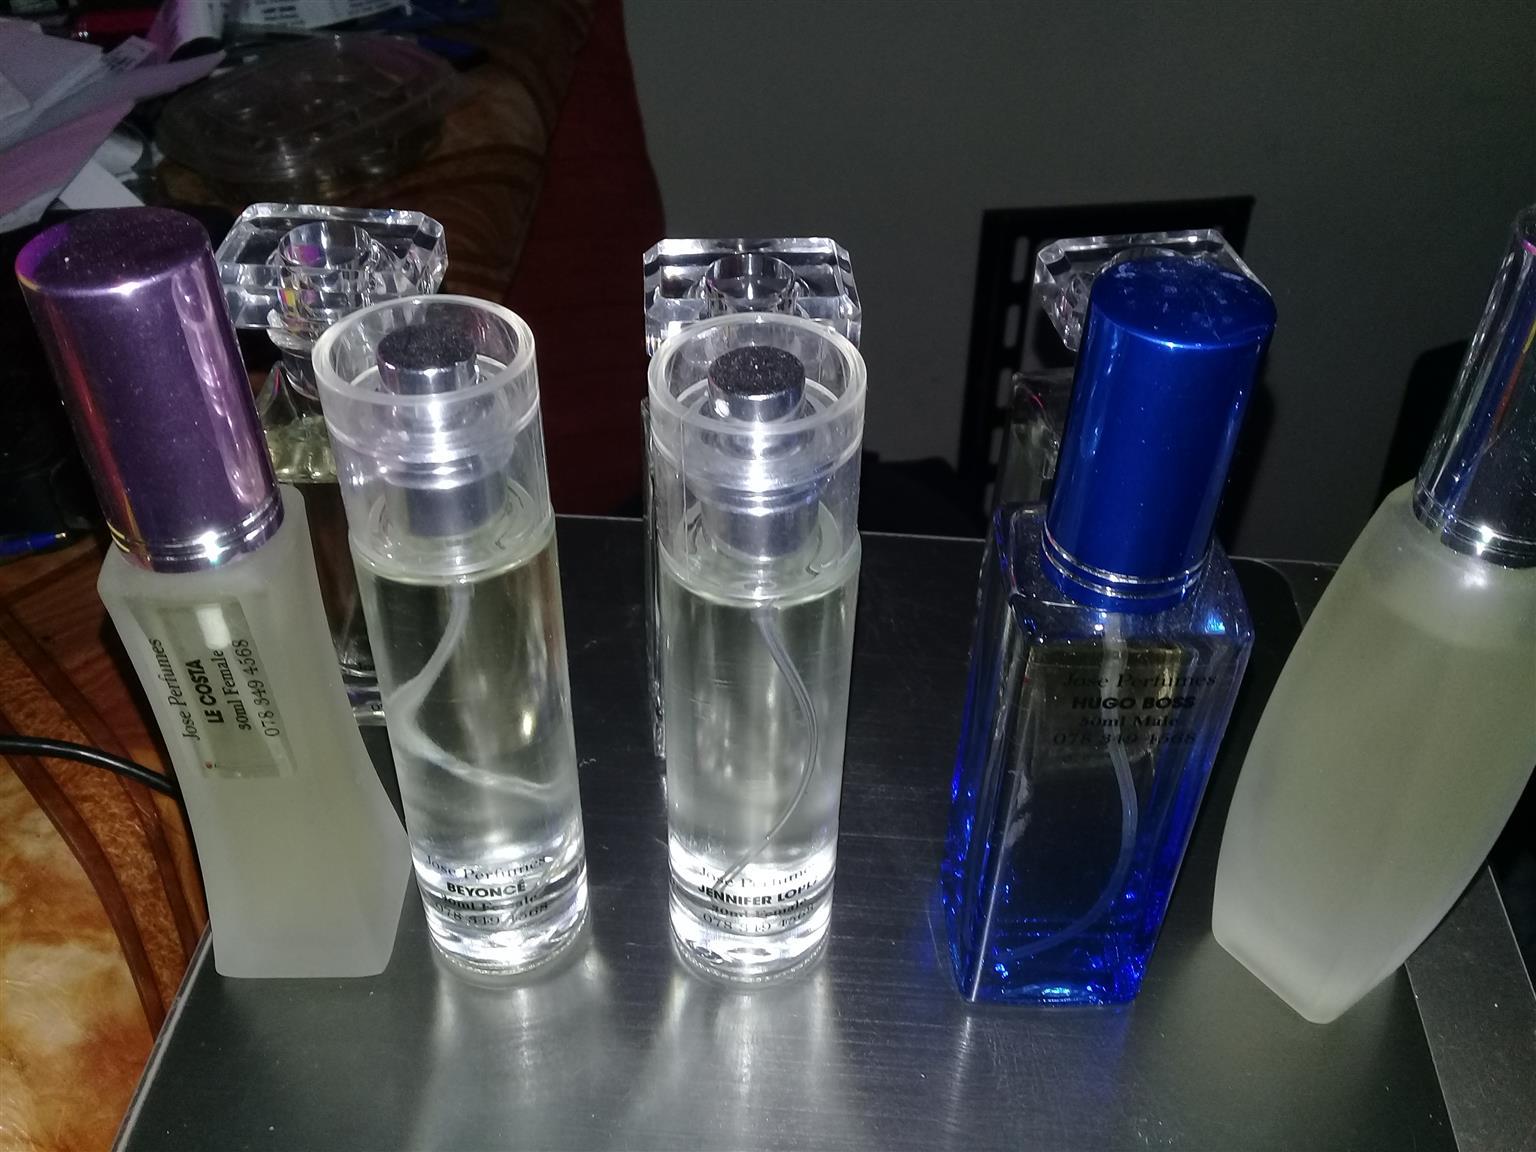 Fragrance/perfumes